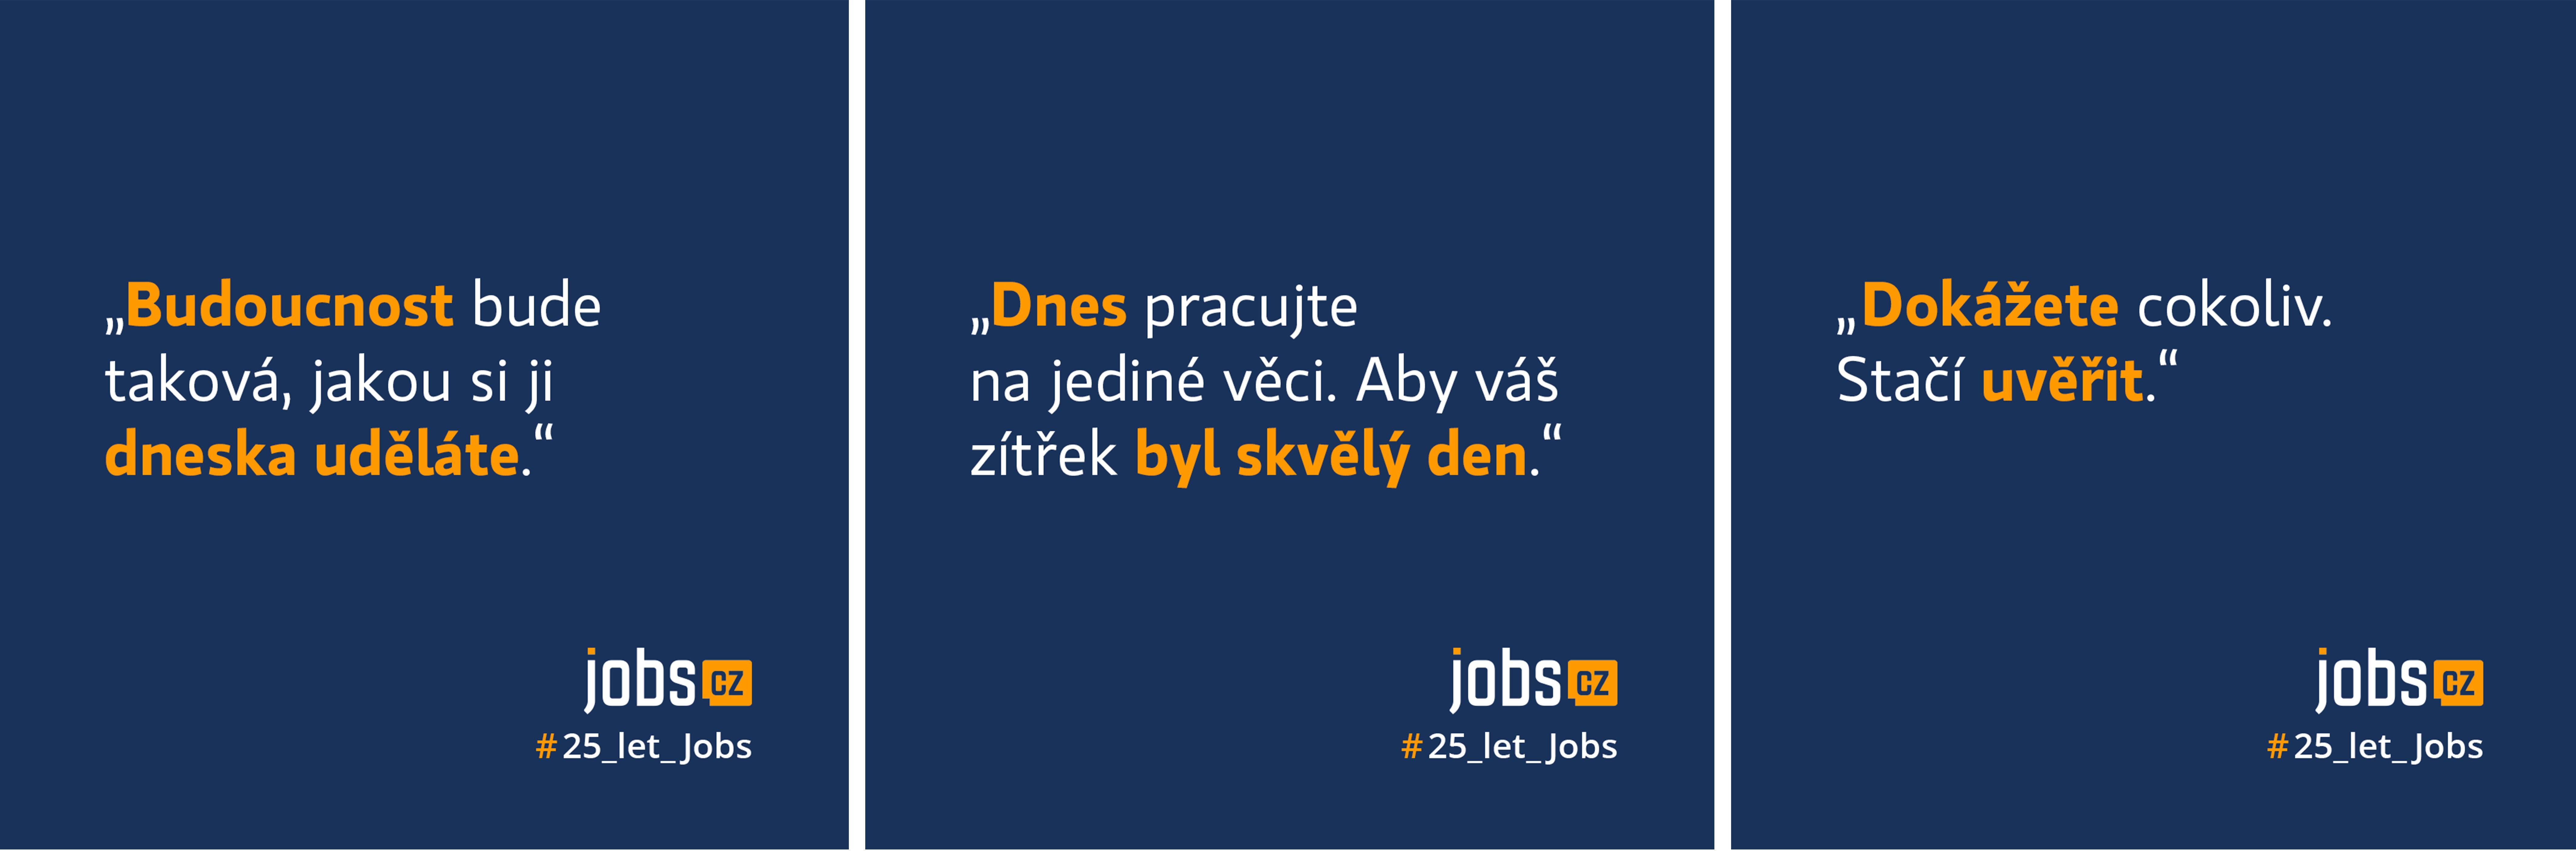 Kampaň Jobs.cz 25 let